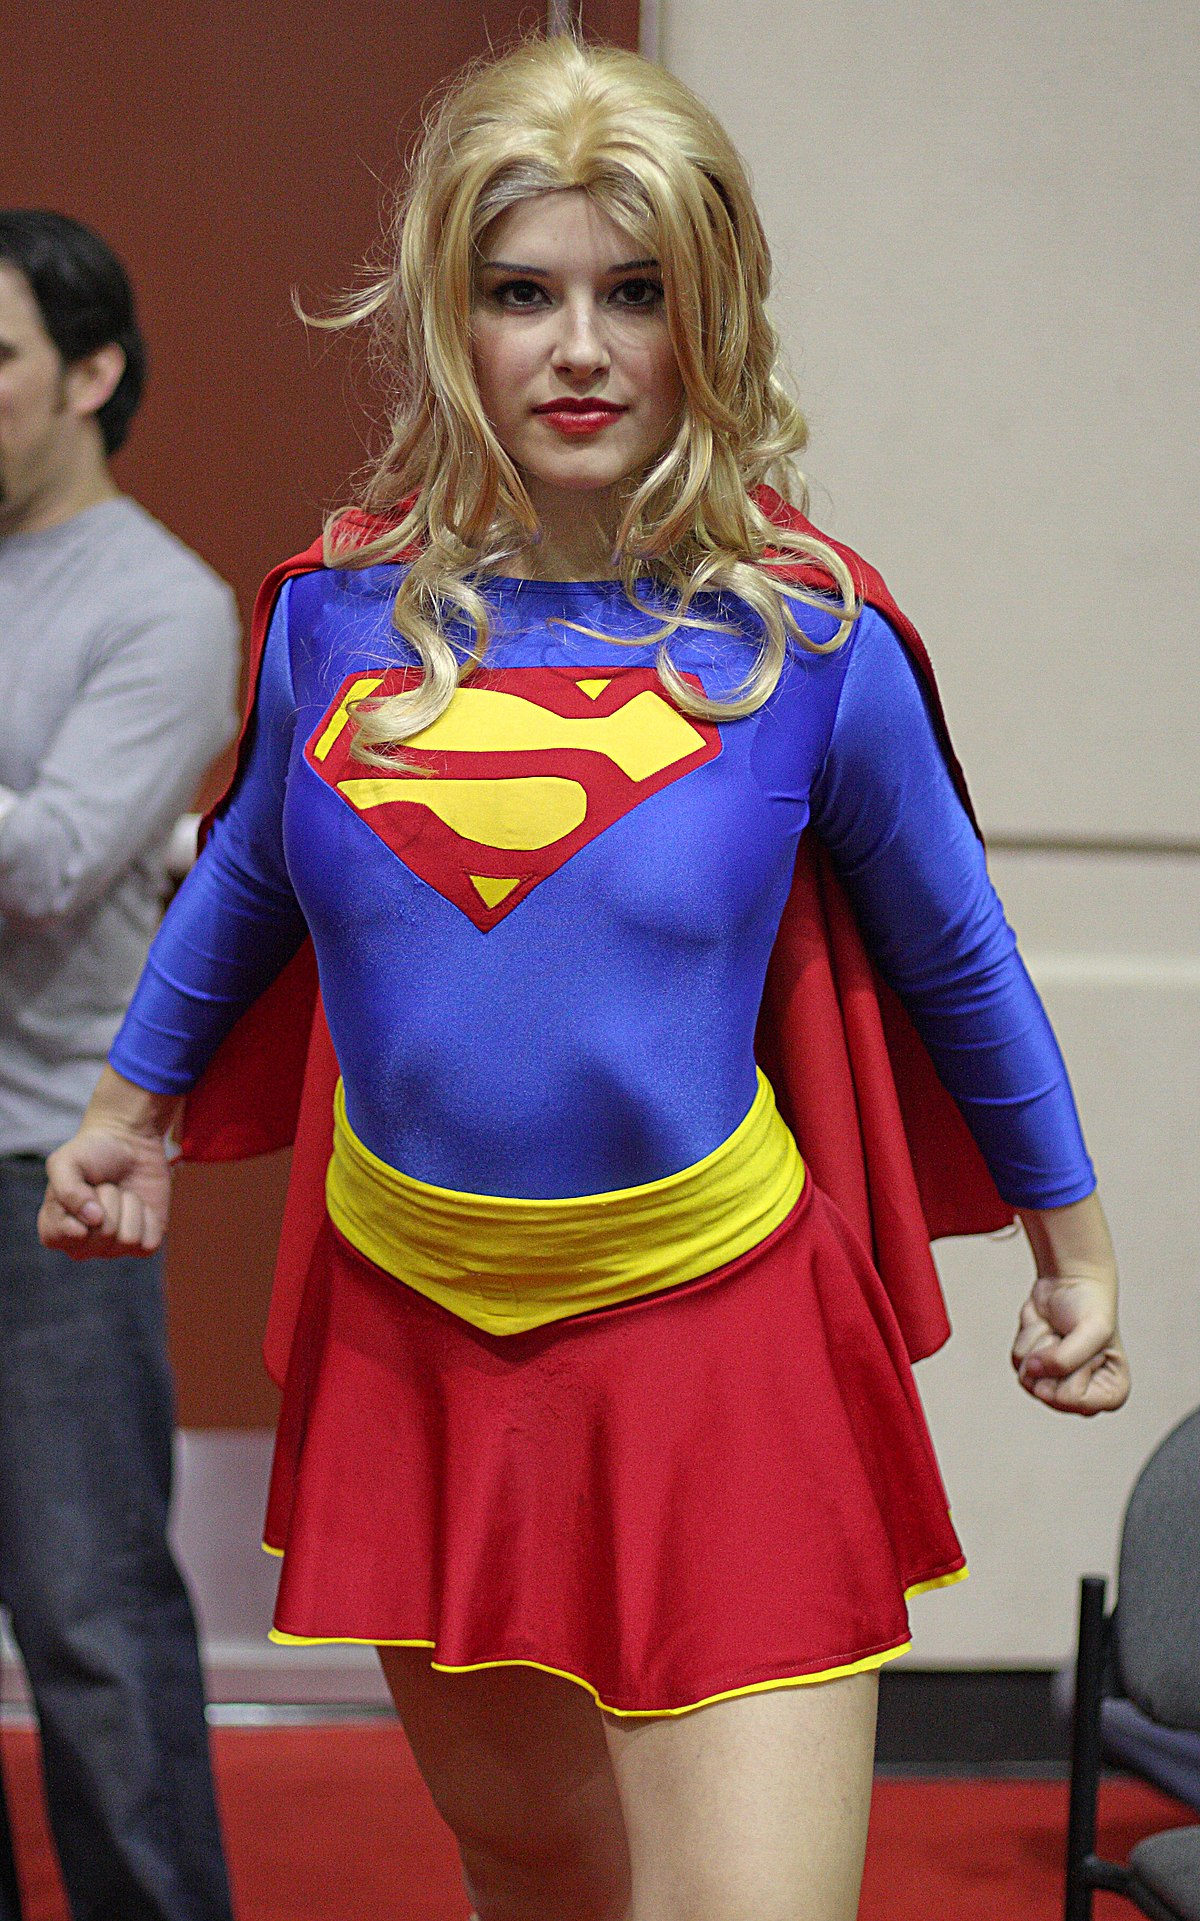 Bestand:Supergirl cosplay.jpg - Wikipedia